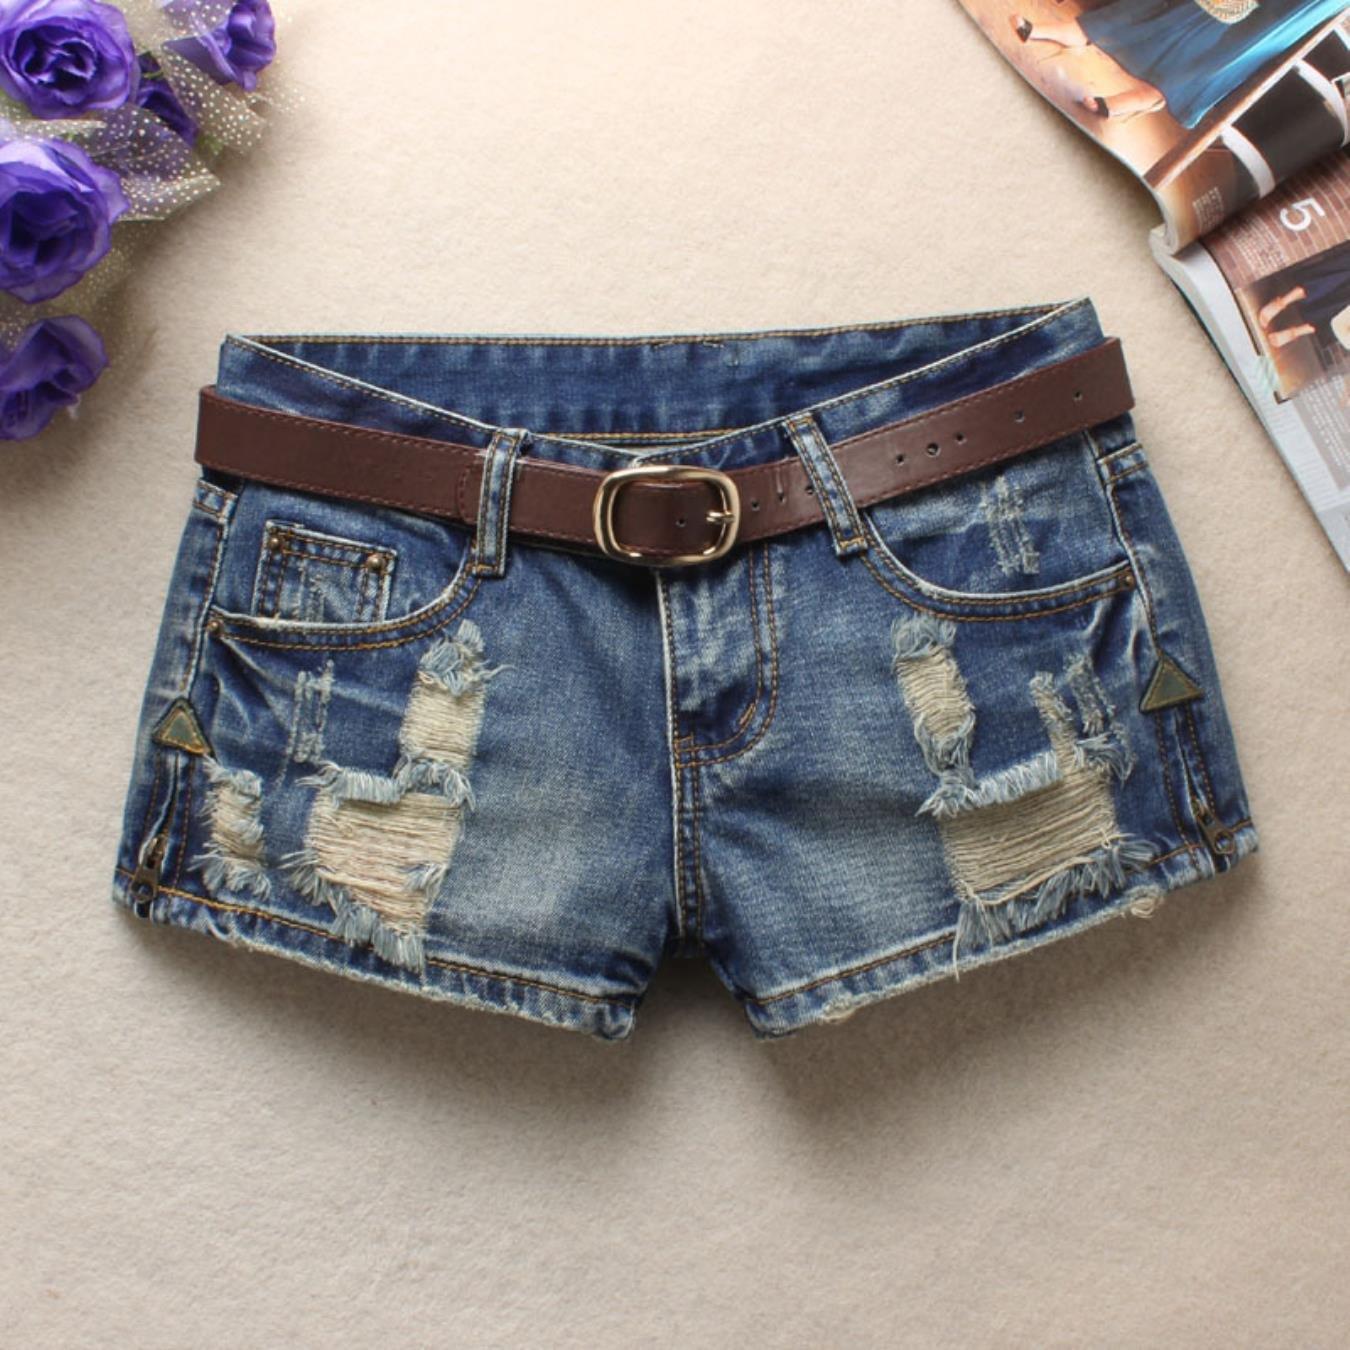 zODsfDWS Women Short Jeans Retro Hole Burr Loose Large Size Women Shorts Fenim Low Waist Shorts